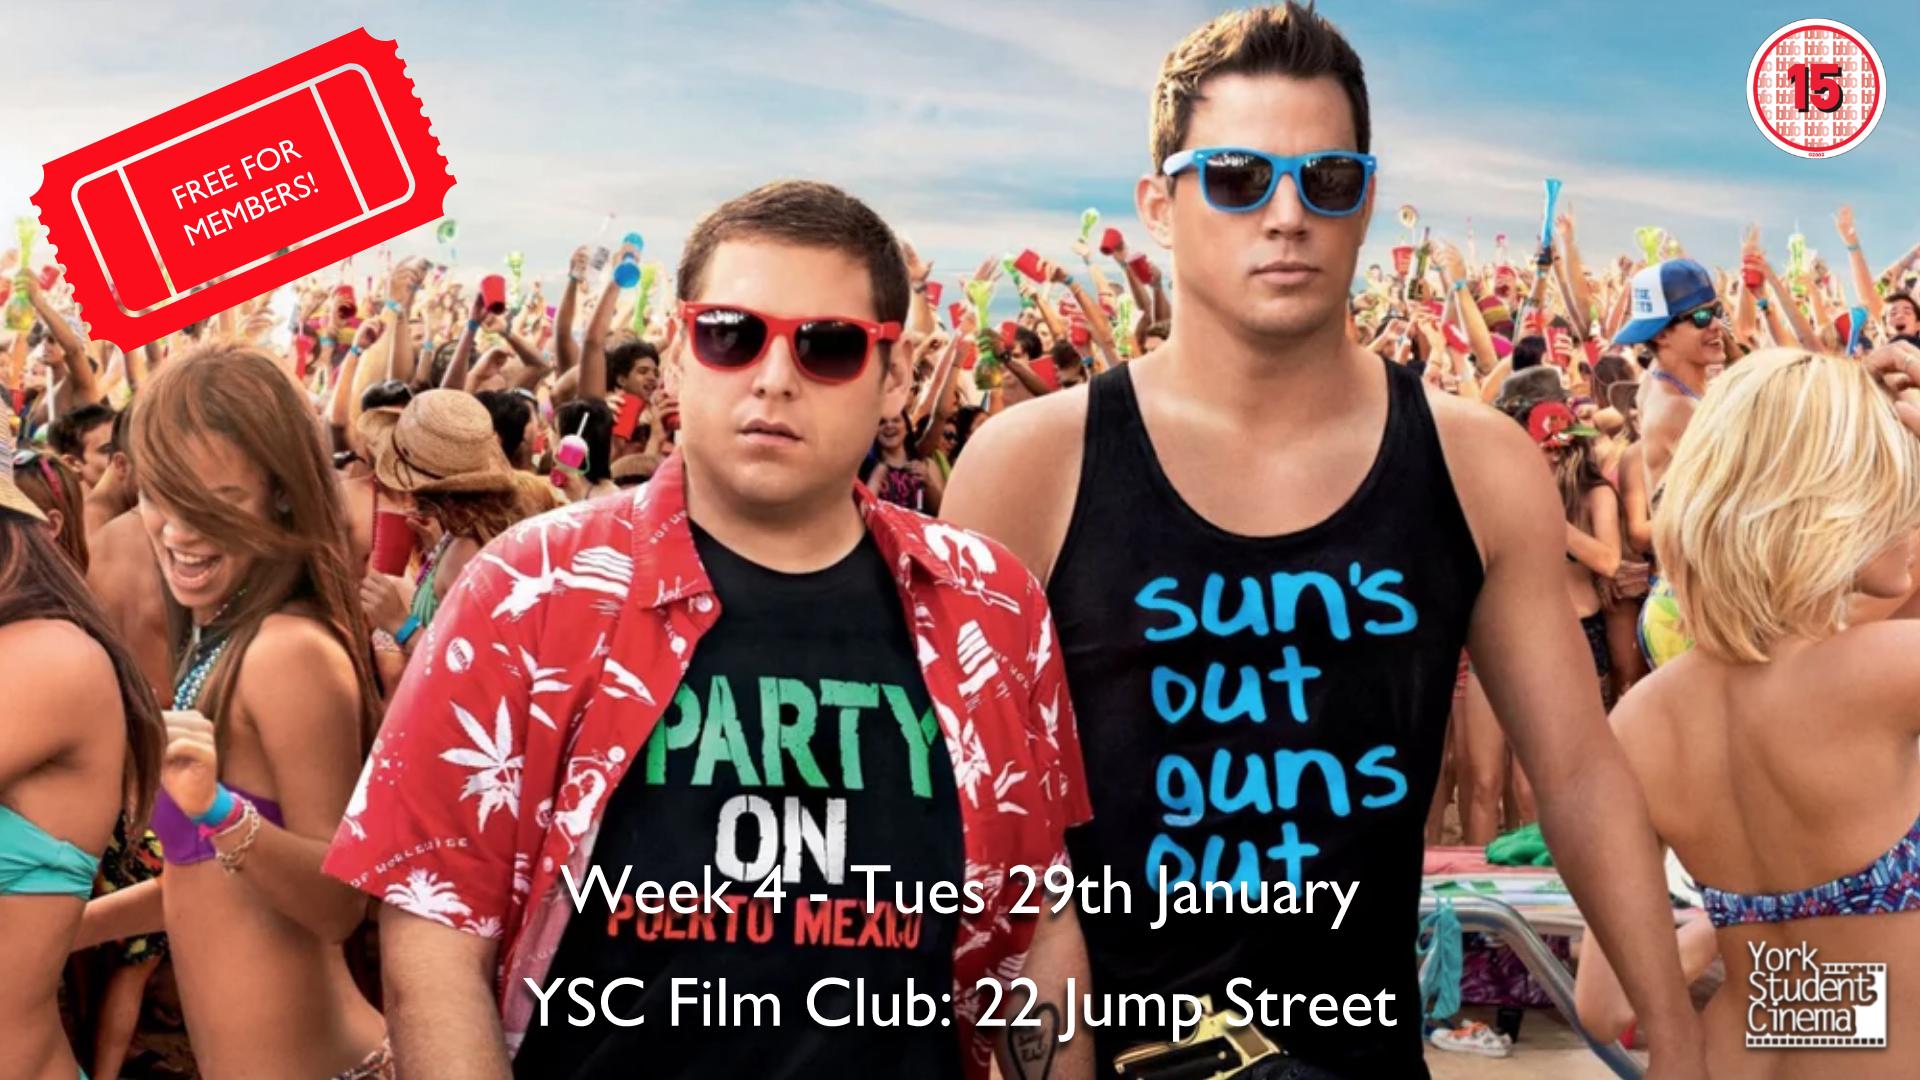 YSC Film Club: 22 Jump Street